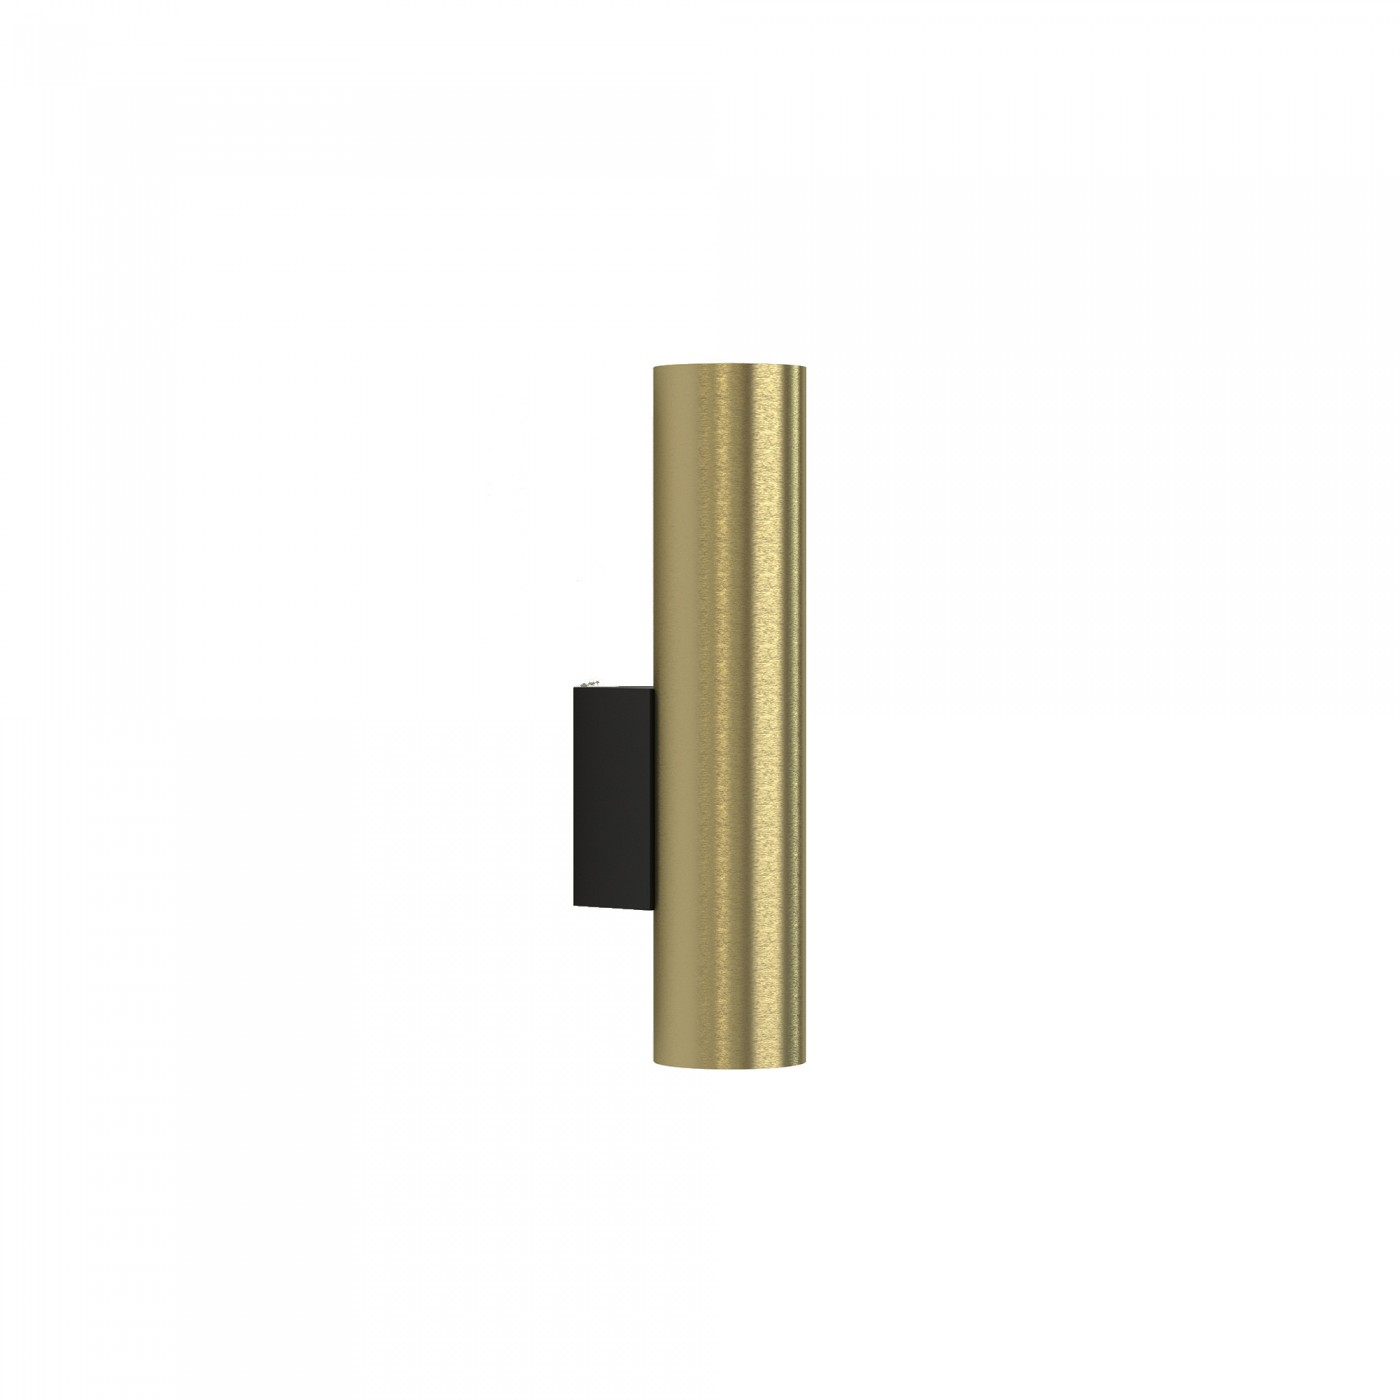 EYE WALL solid brass 8074 Nowodvorski Lighting